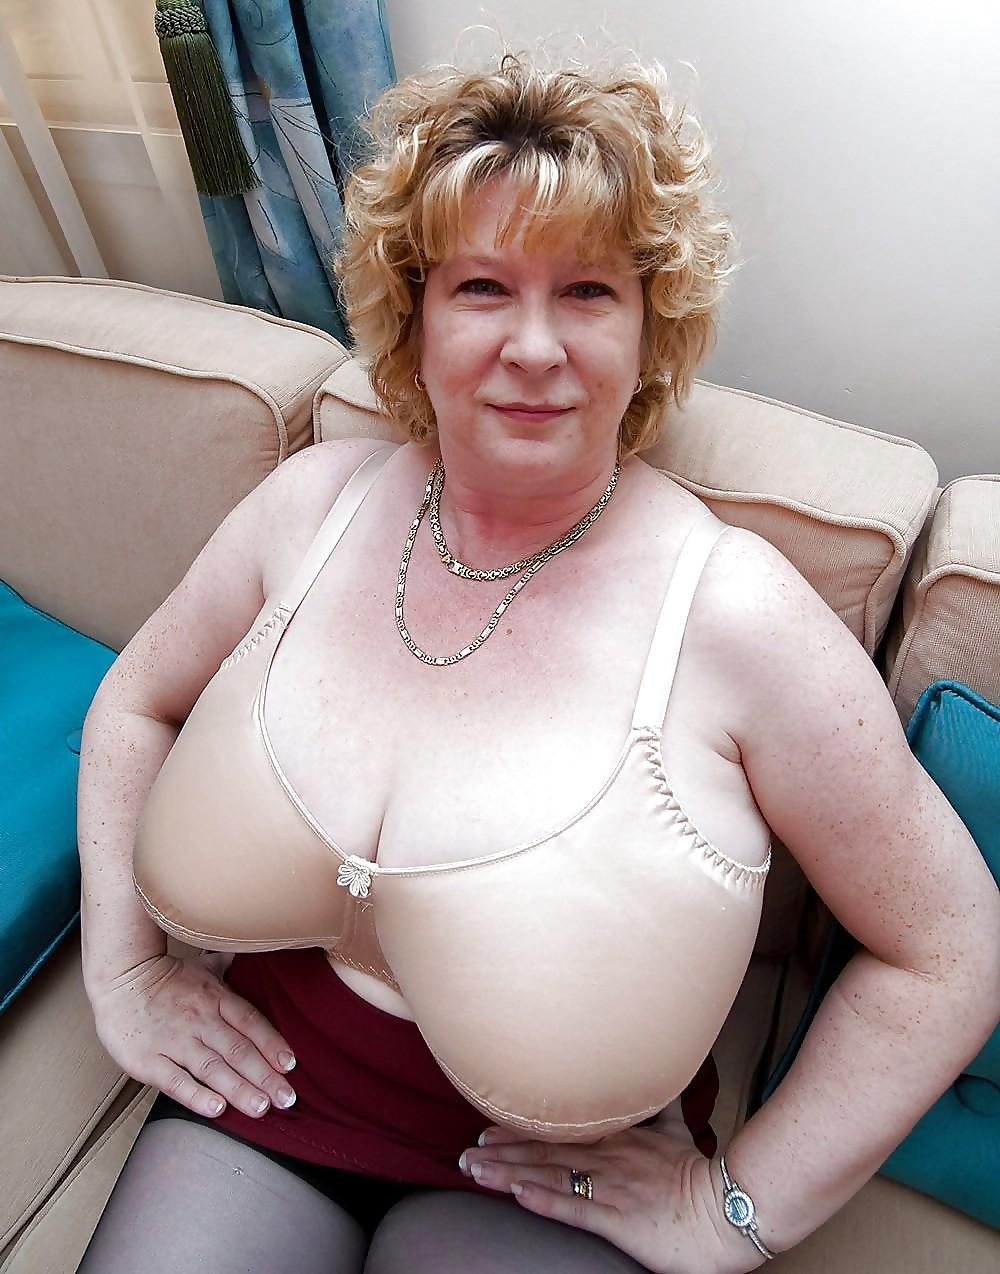 Free porn granny bra playing golf naked